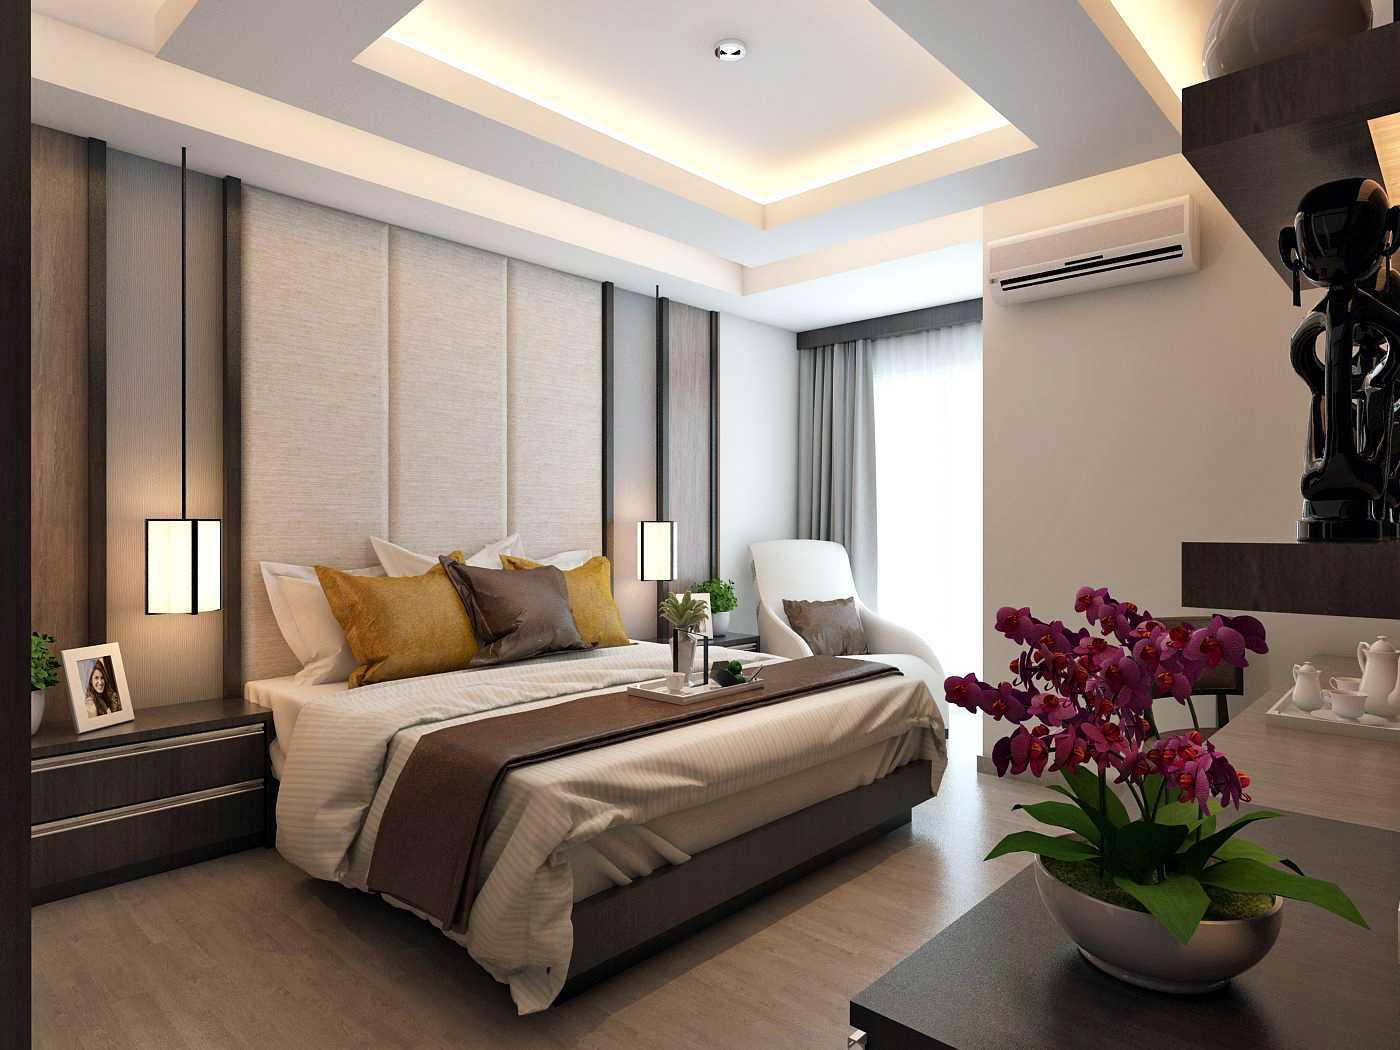 Habibullah Alfatih Condominium - Greenbay Pluit Jakarta, Indonesia Jakarta, Indonesia Master-Bedroom-2 Kontemporer 35909